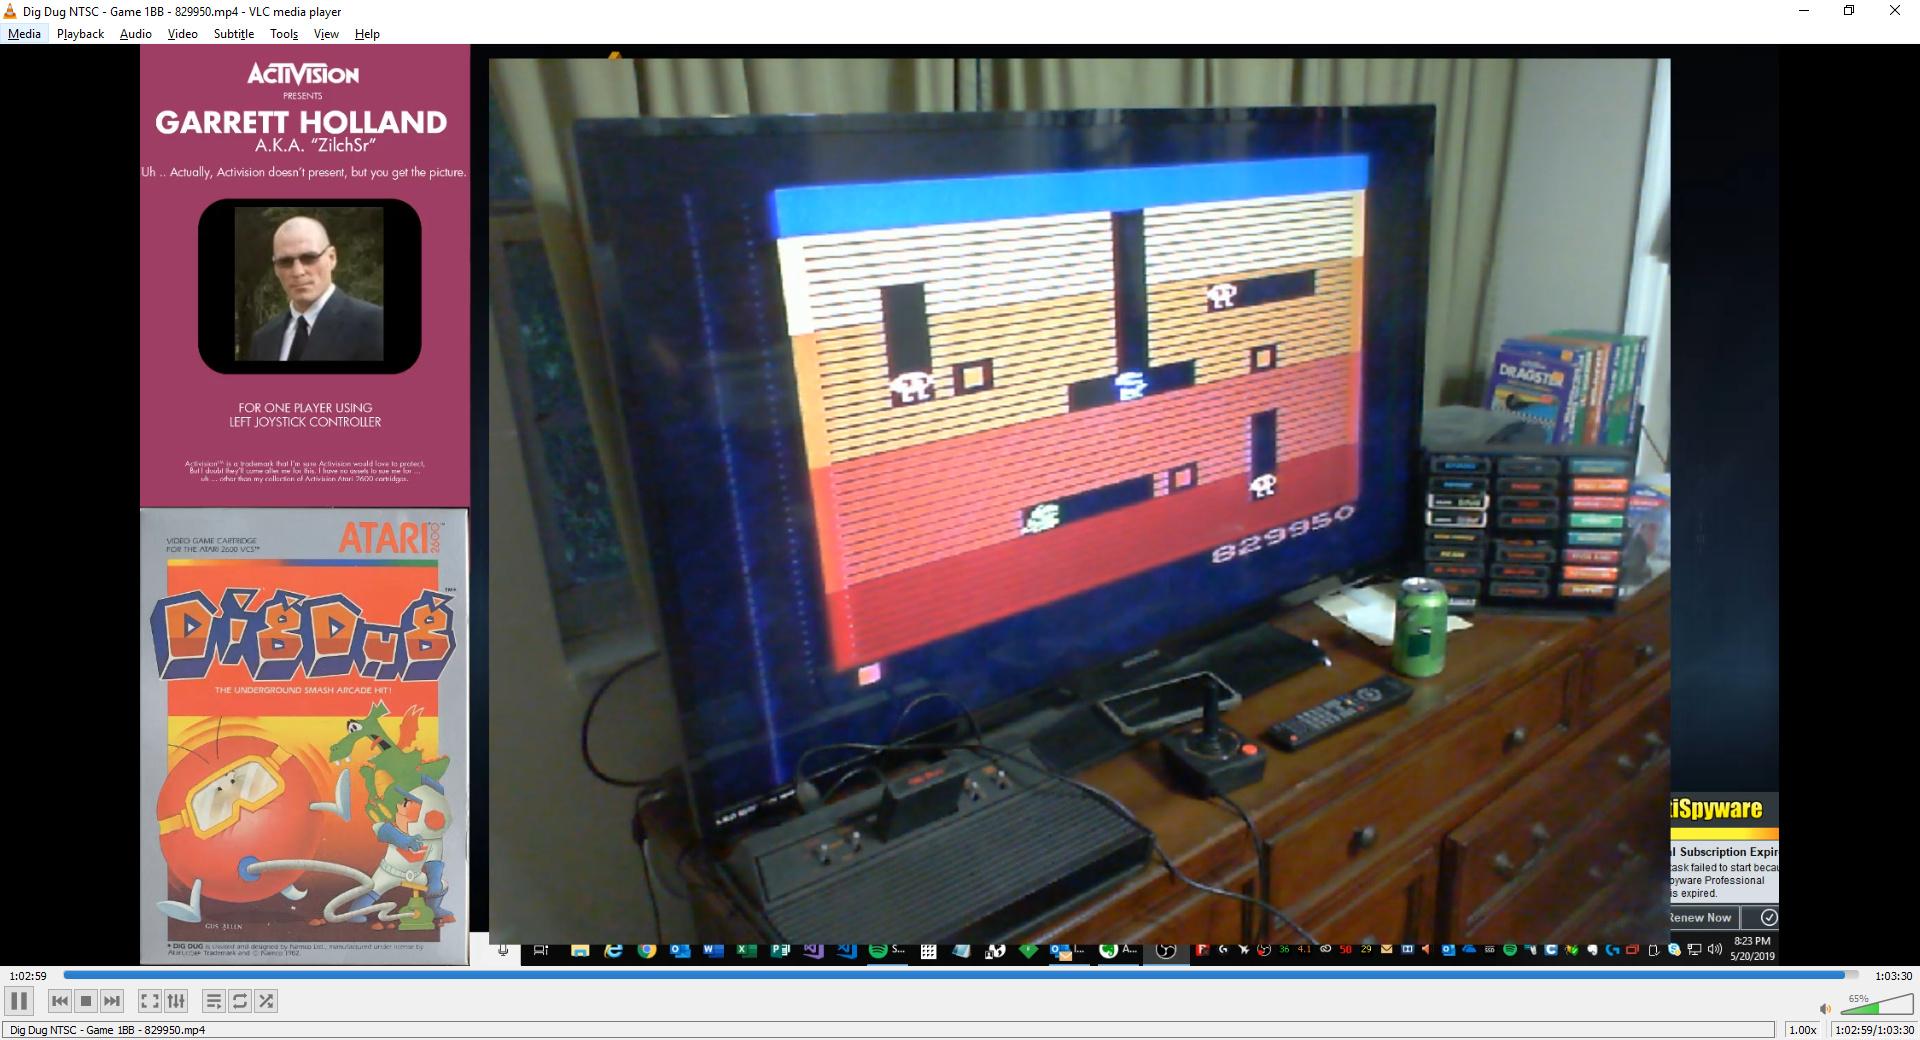 ZilchSr: Dig Dug (Atari 2600) 829,950 points on 2019-05-20 20:48:03